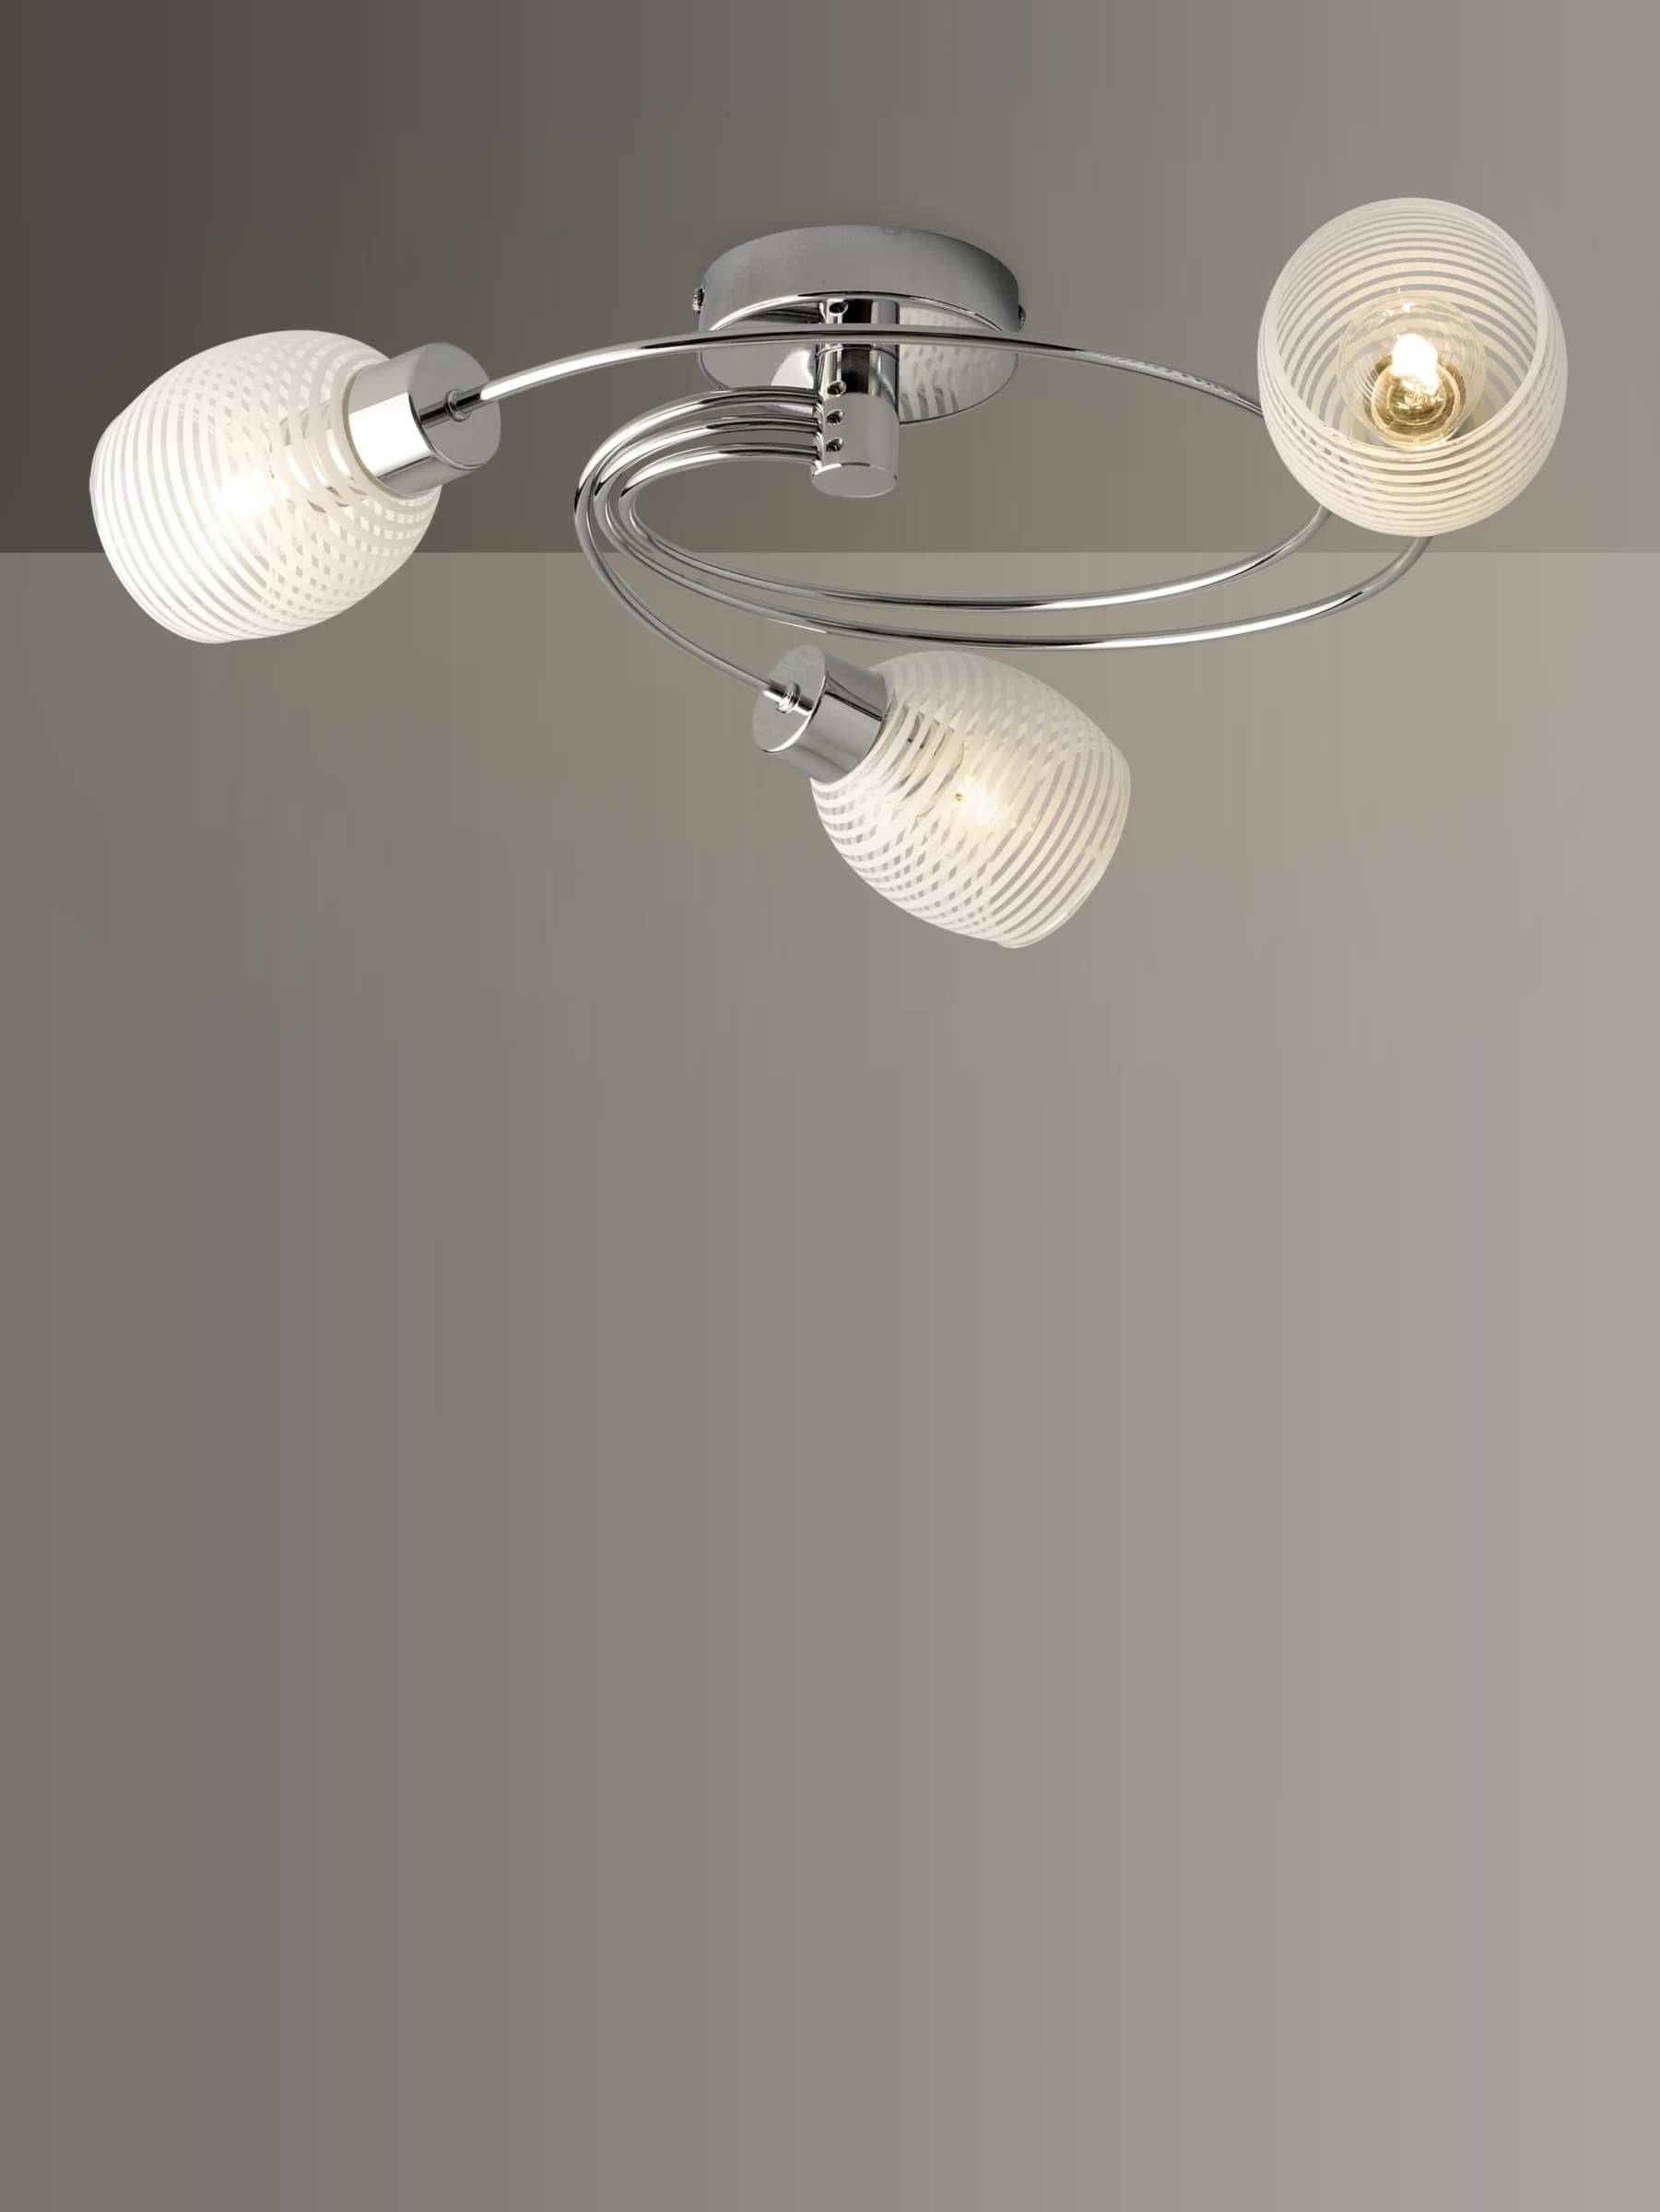 john lewis ceiling lighting